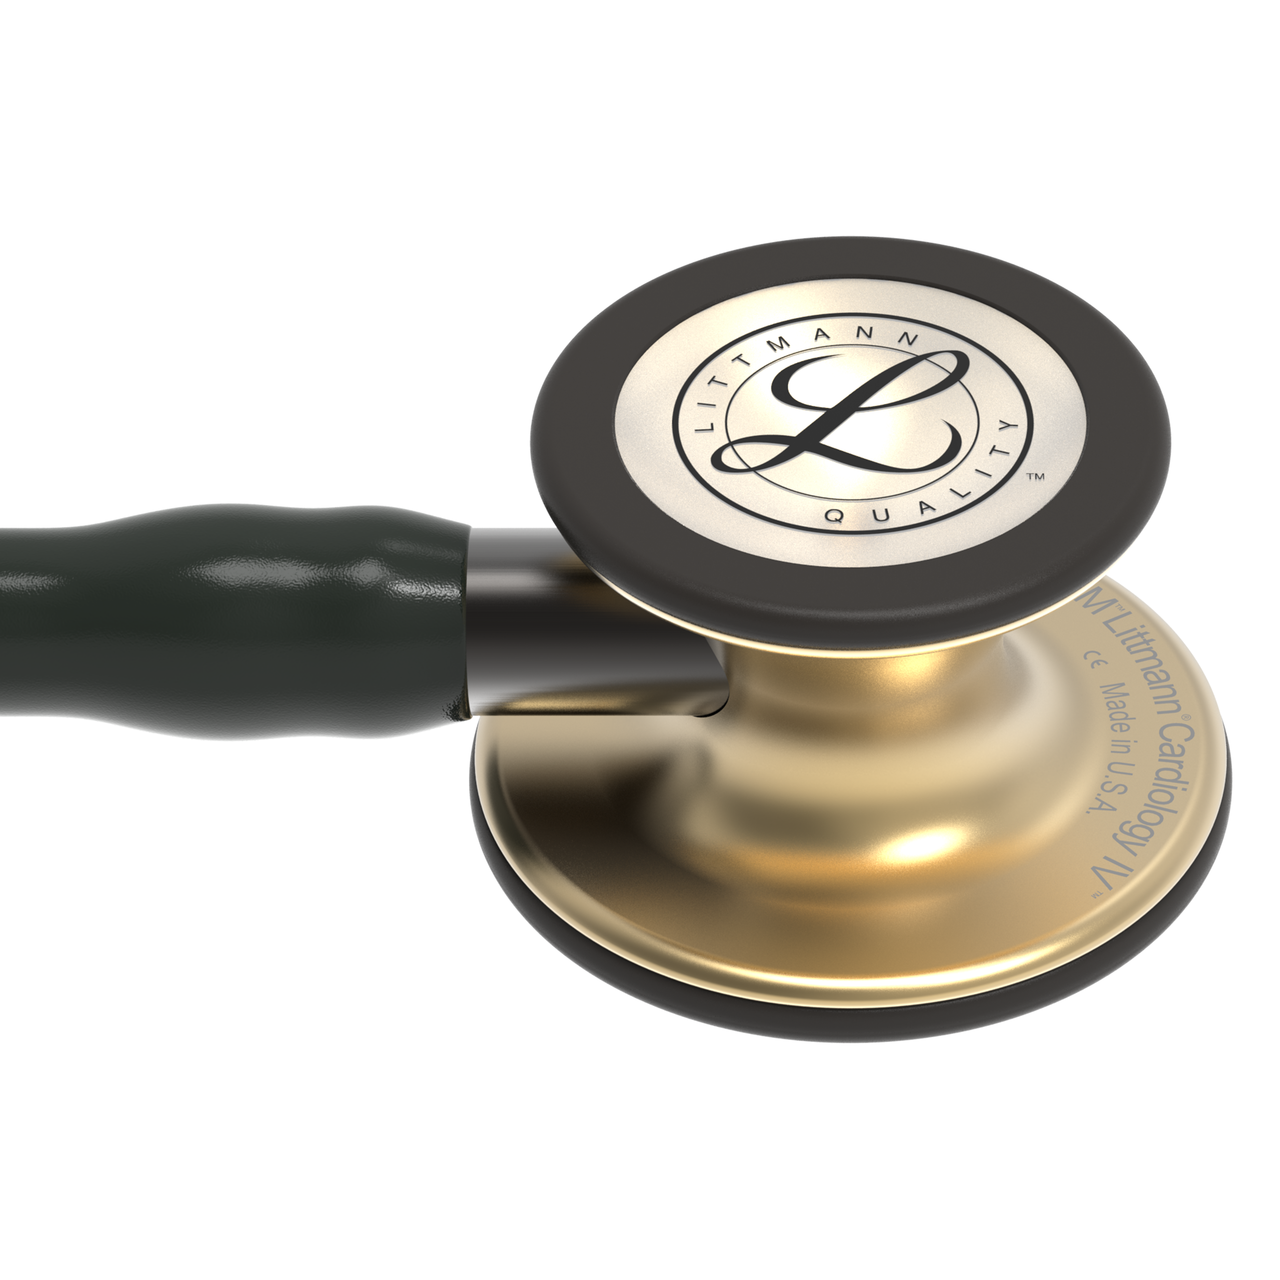 Littmann Cardiology IV Stethoscope, Brass Edition 6164